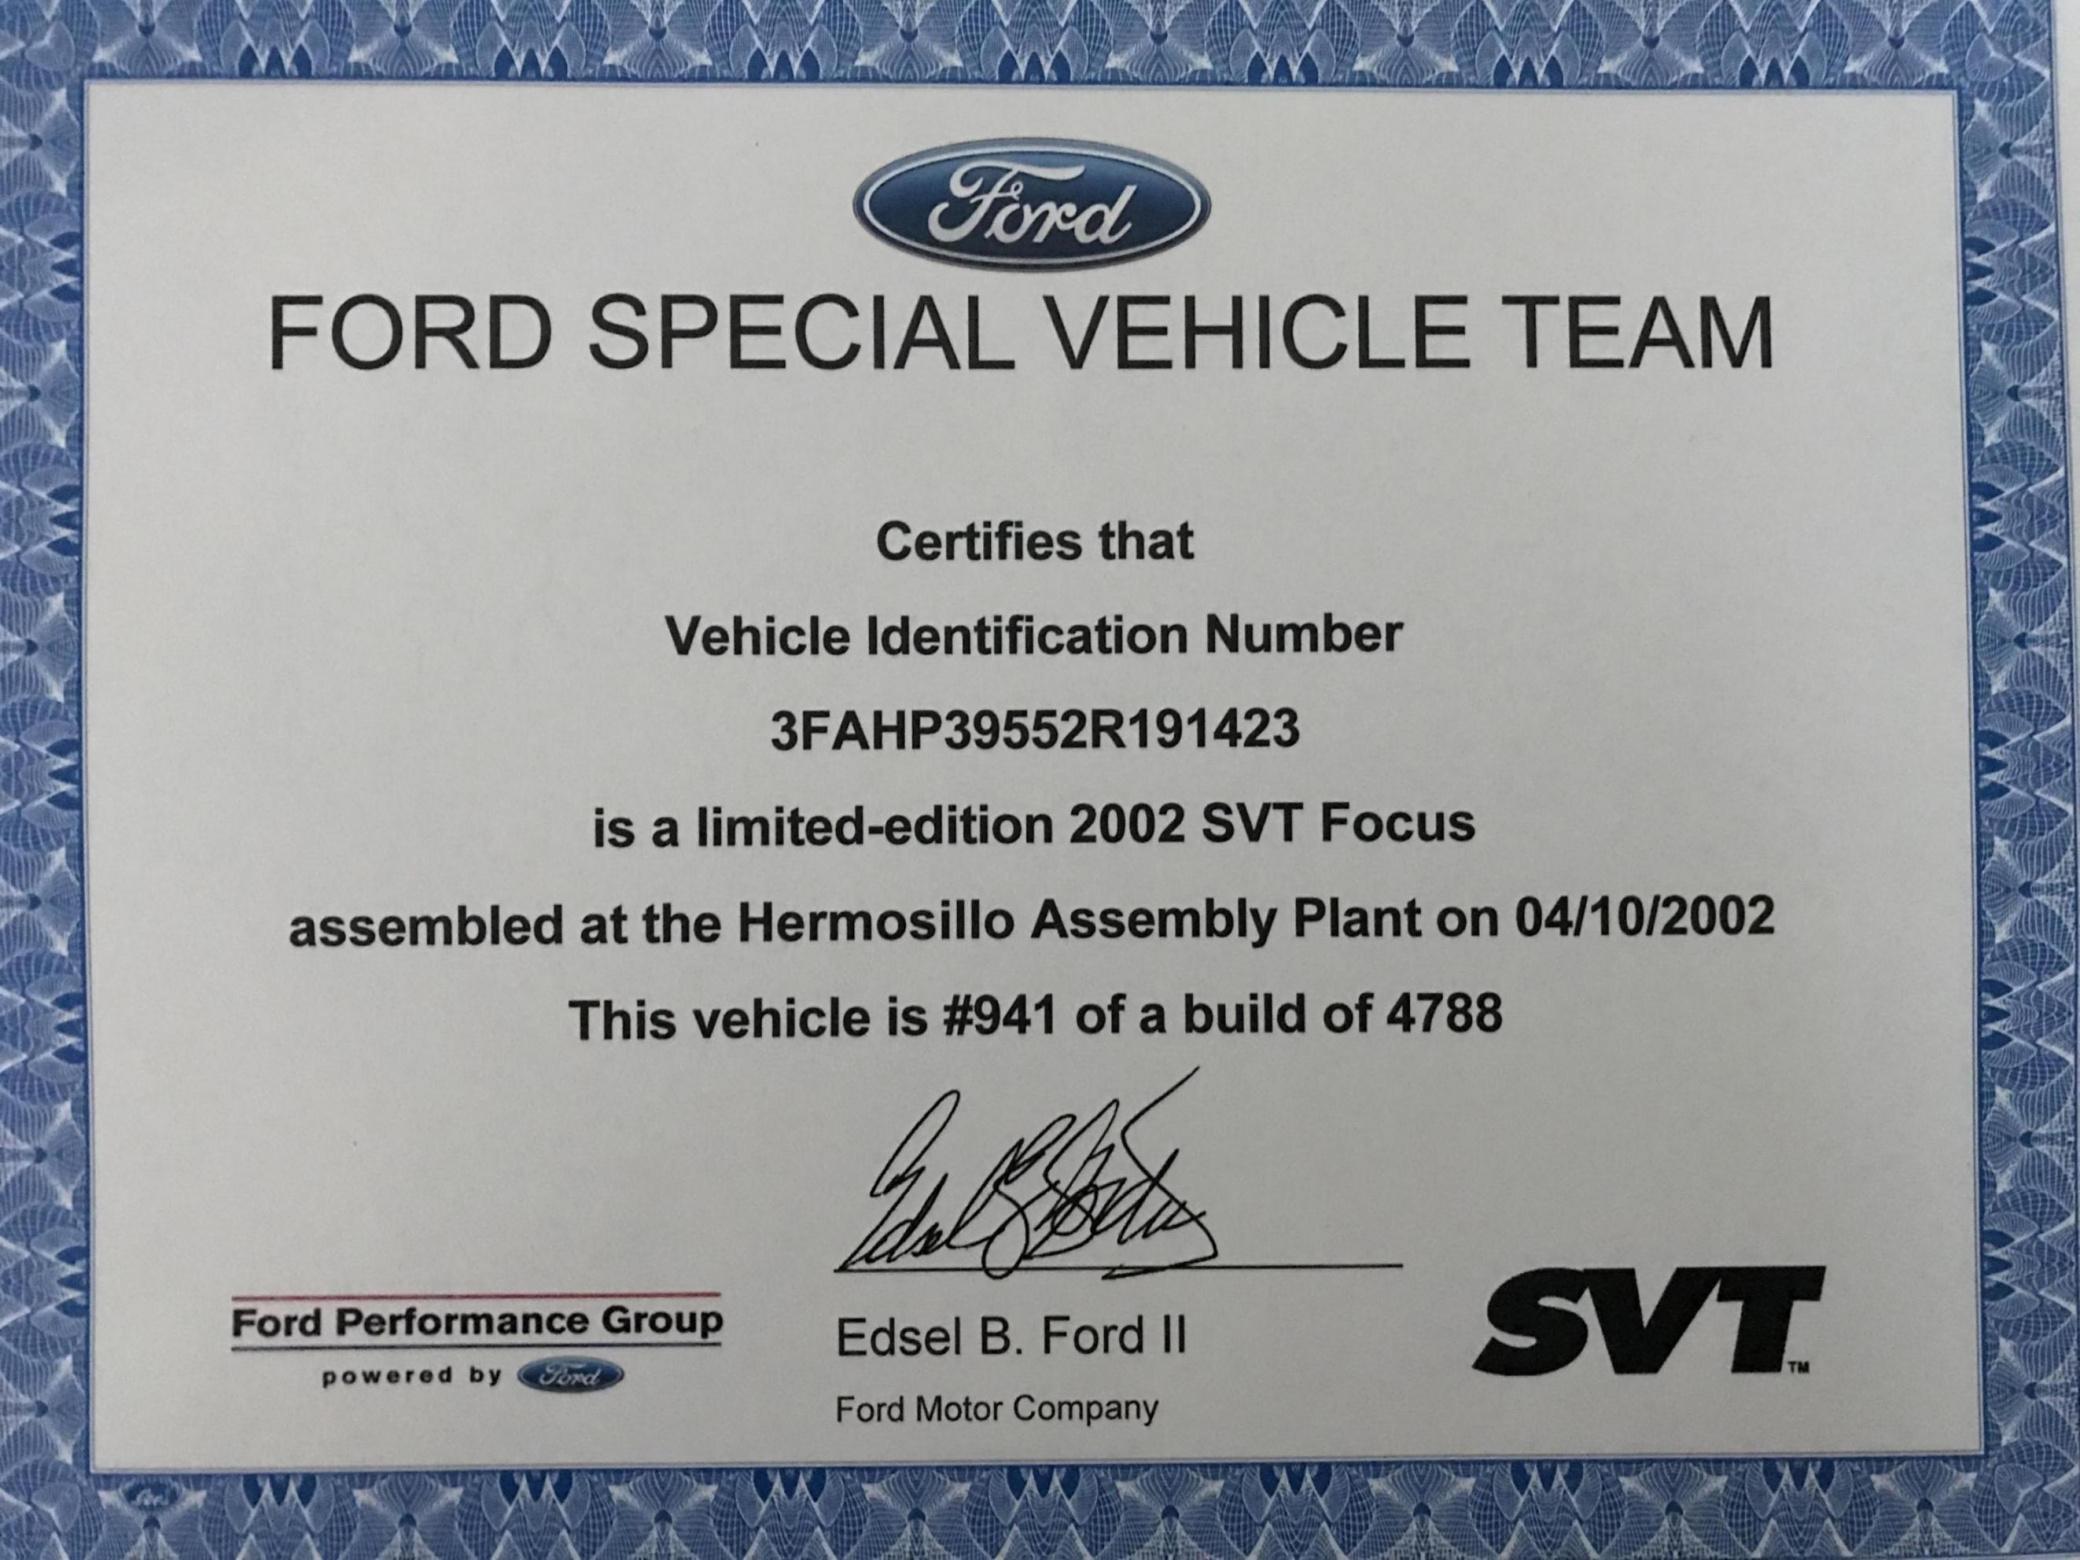 Production certificate-f6835264-9f2e-4ae1-9594-65d33888375a_1552683875550.jpg